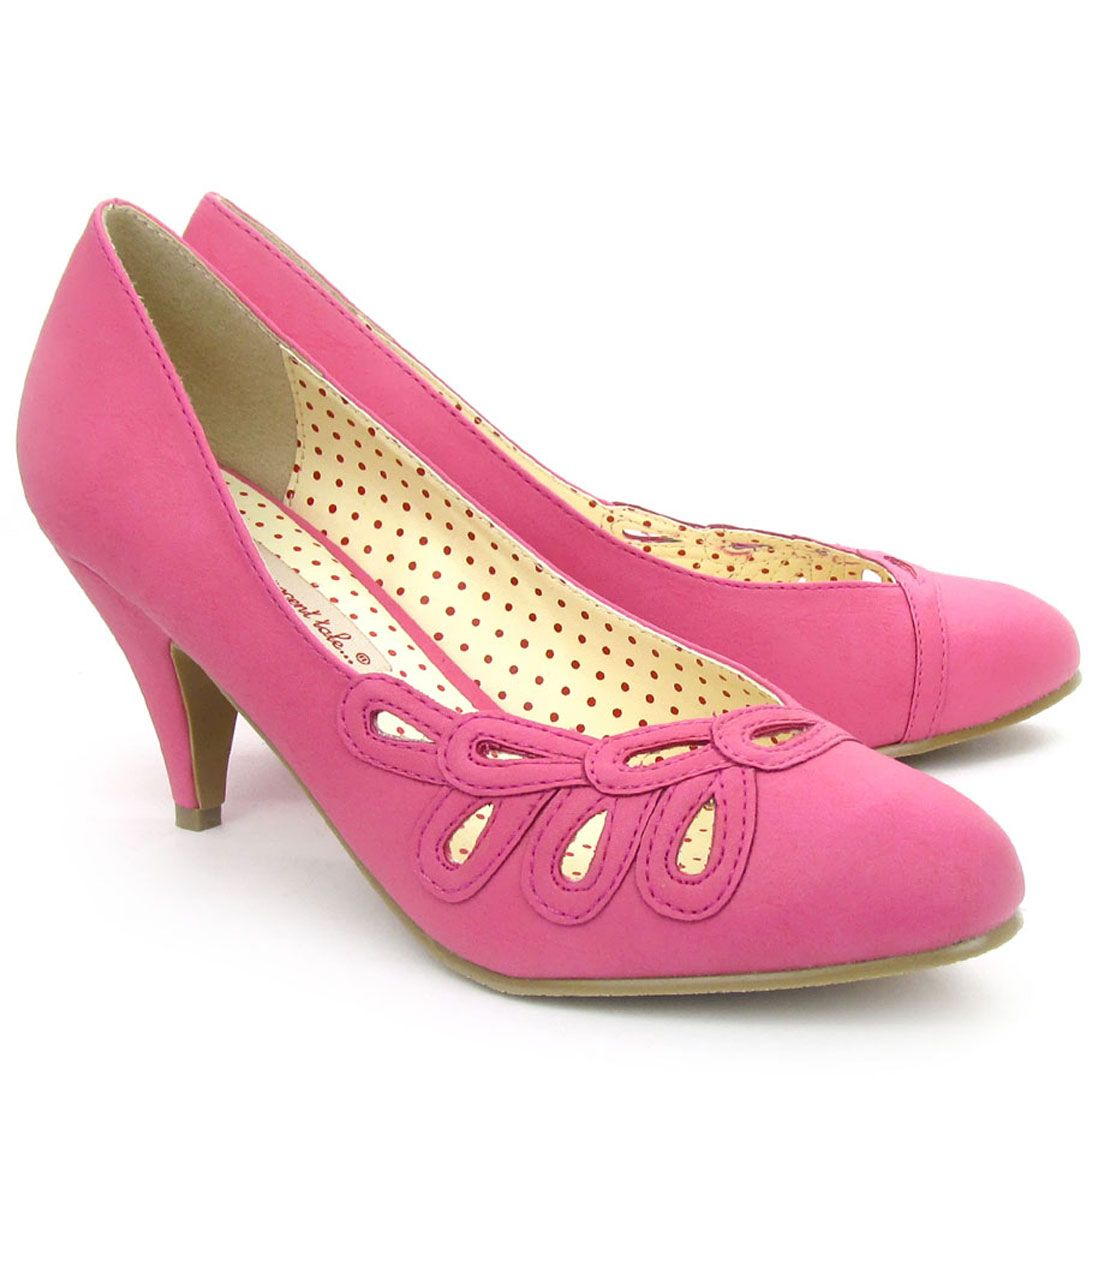 fd5dd99857b0 10 Popular 1950s Shoe Styles for Women photo  VintageDancer.com